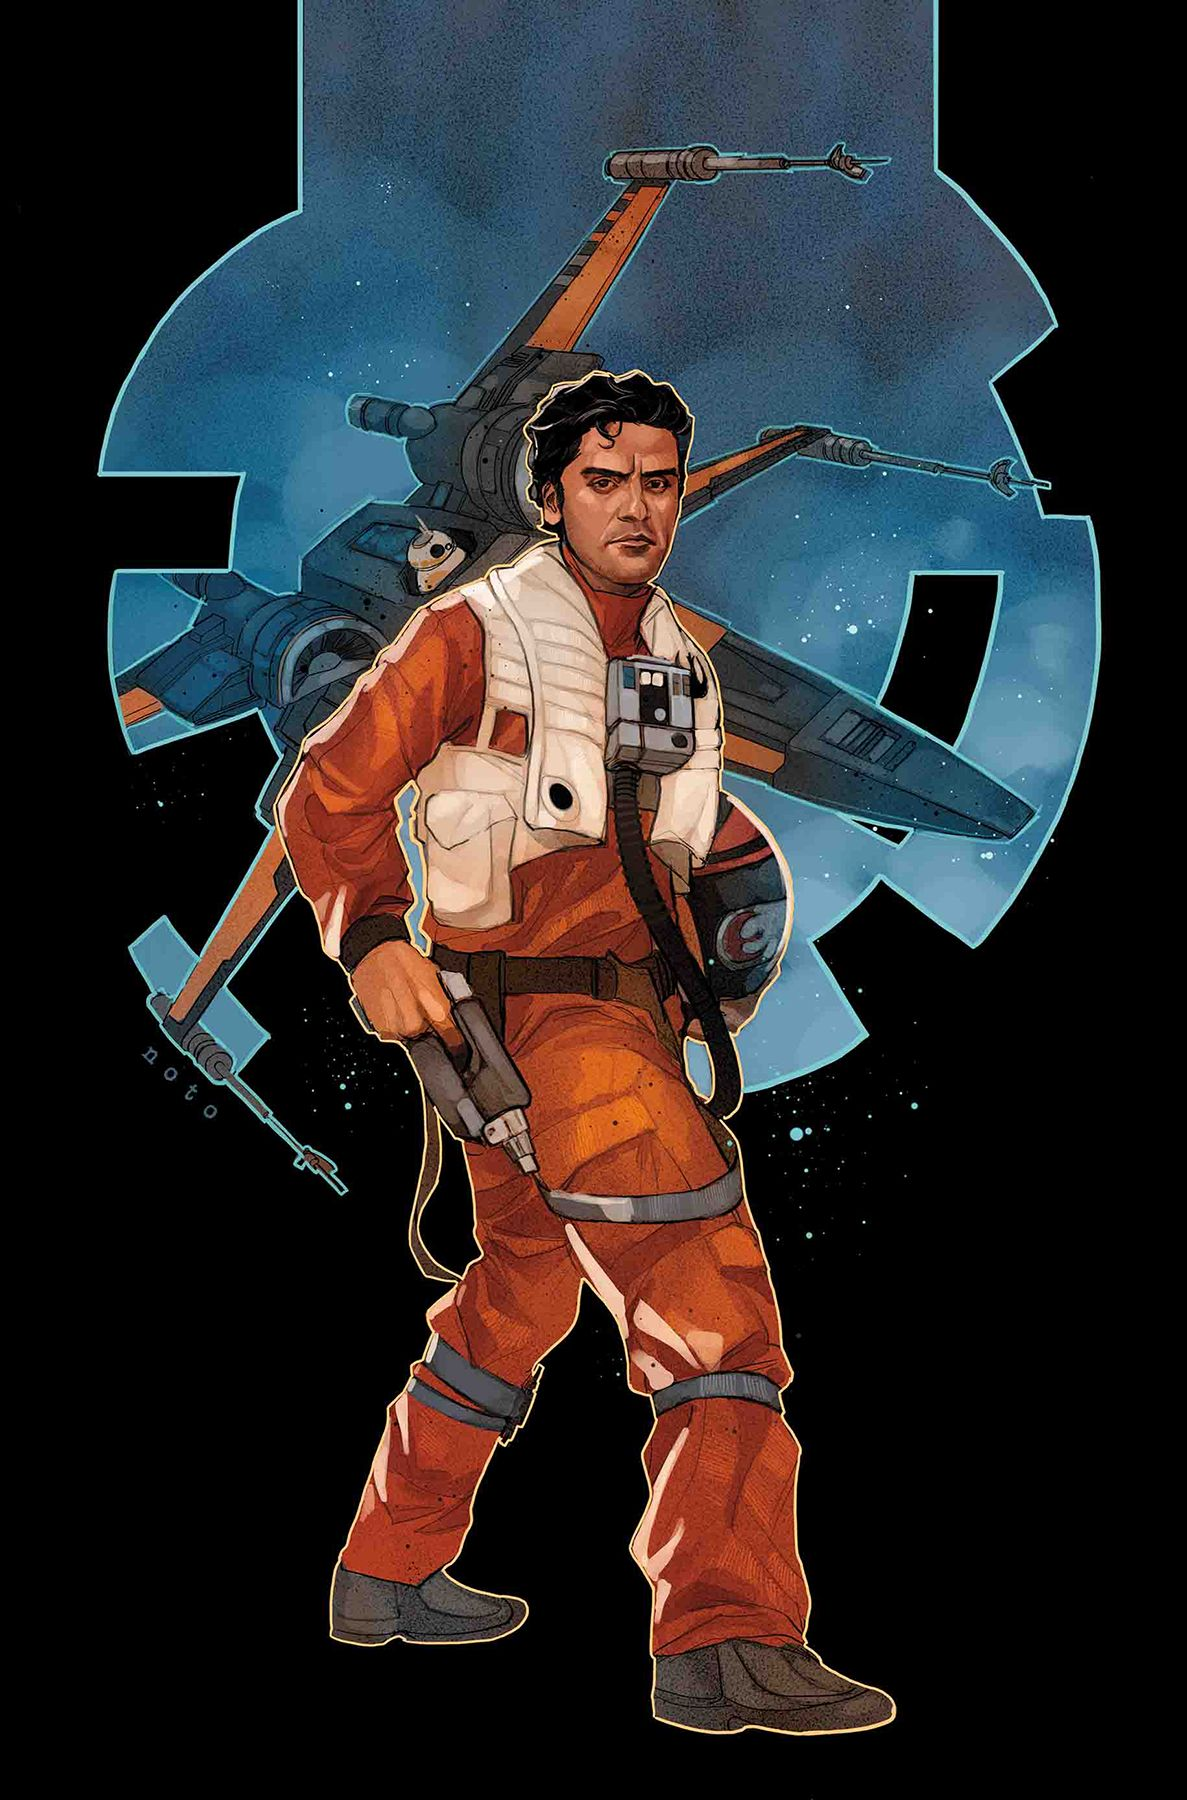 Star Wars Age of Resistance: Poe Dameron